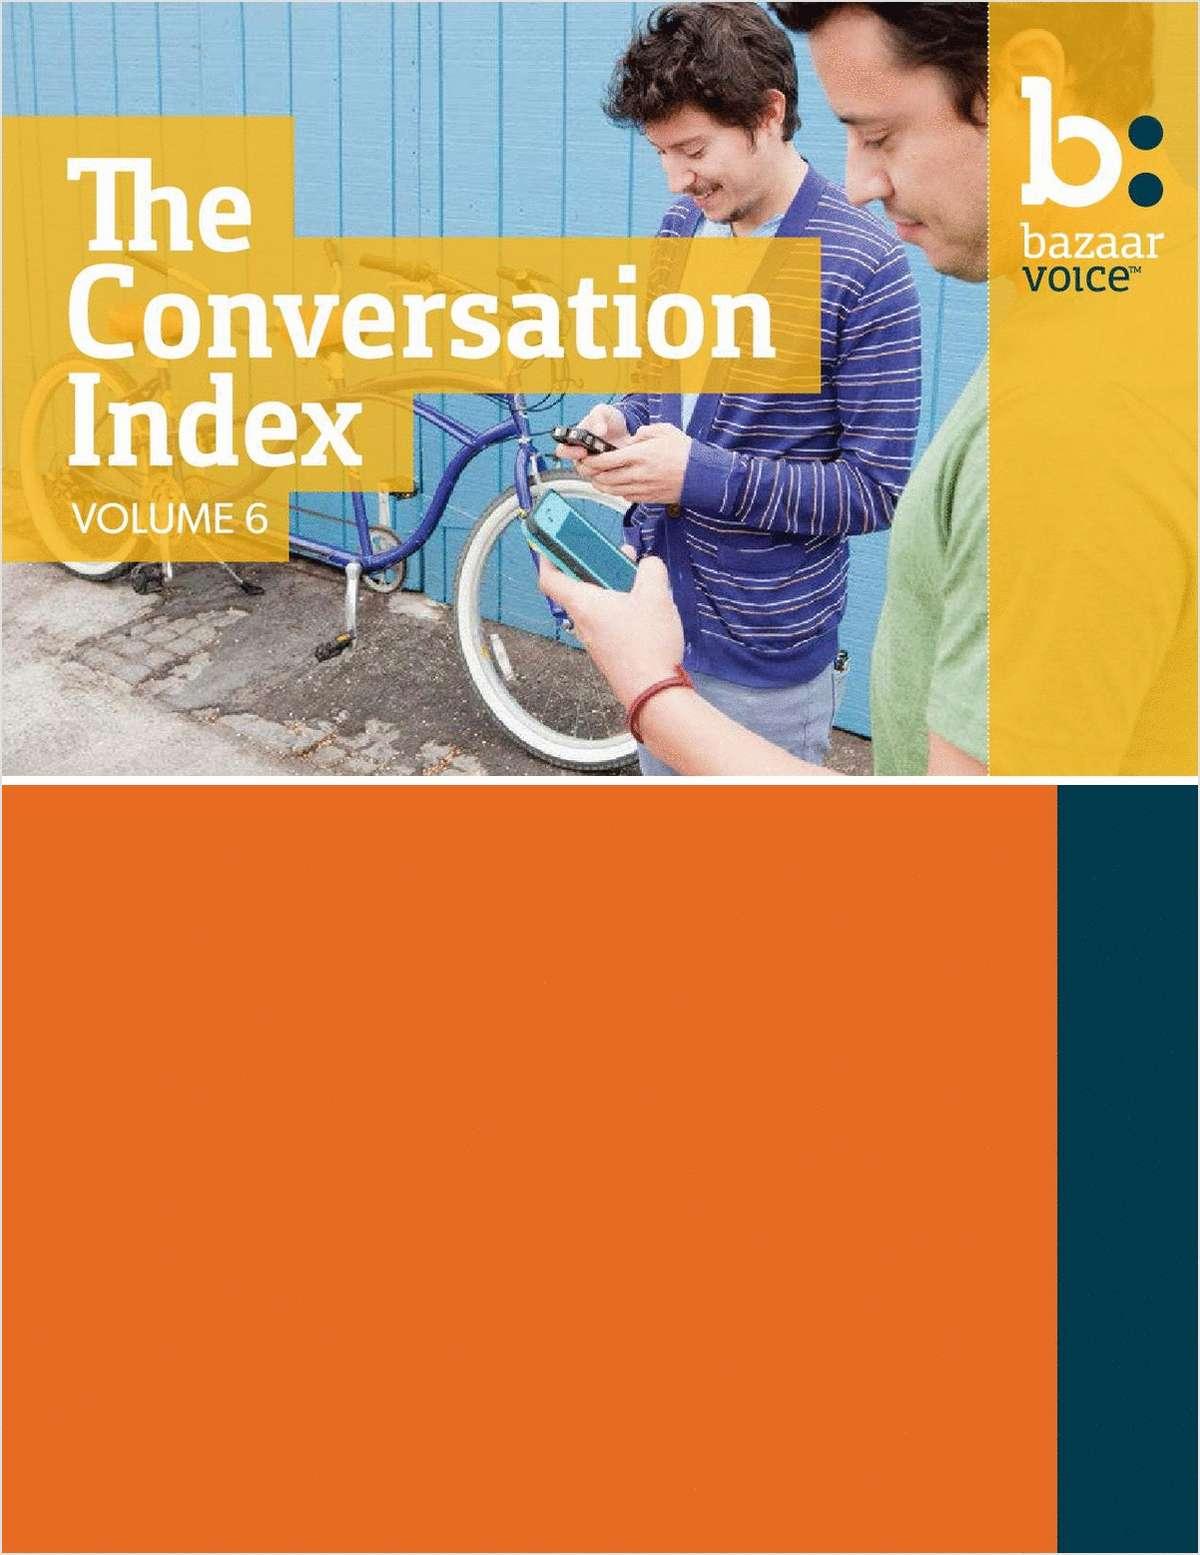 When Brands Respond: How Brand-Consumer Conversations Improve Business